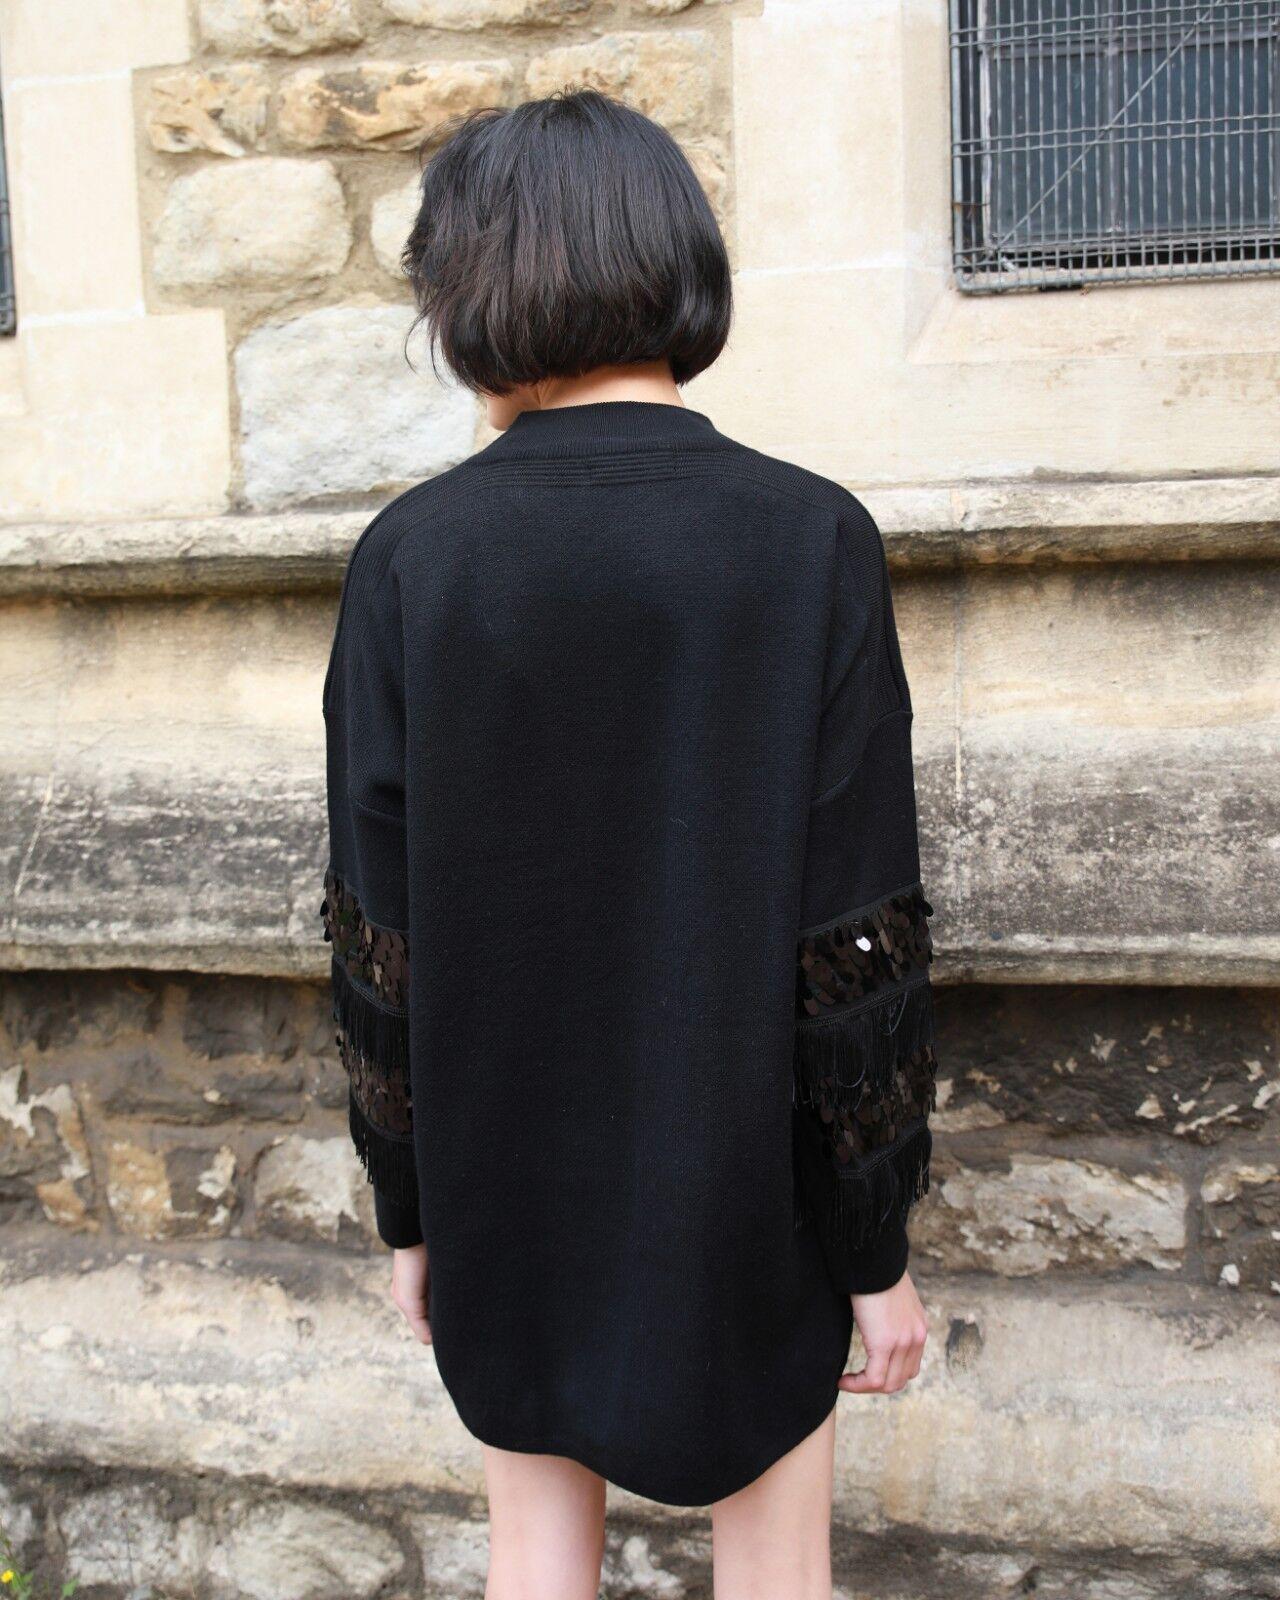 Tassel fringed and sequin embellished tunic knitted jumper dress dress dress wool blend 2e1309